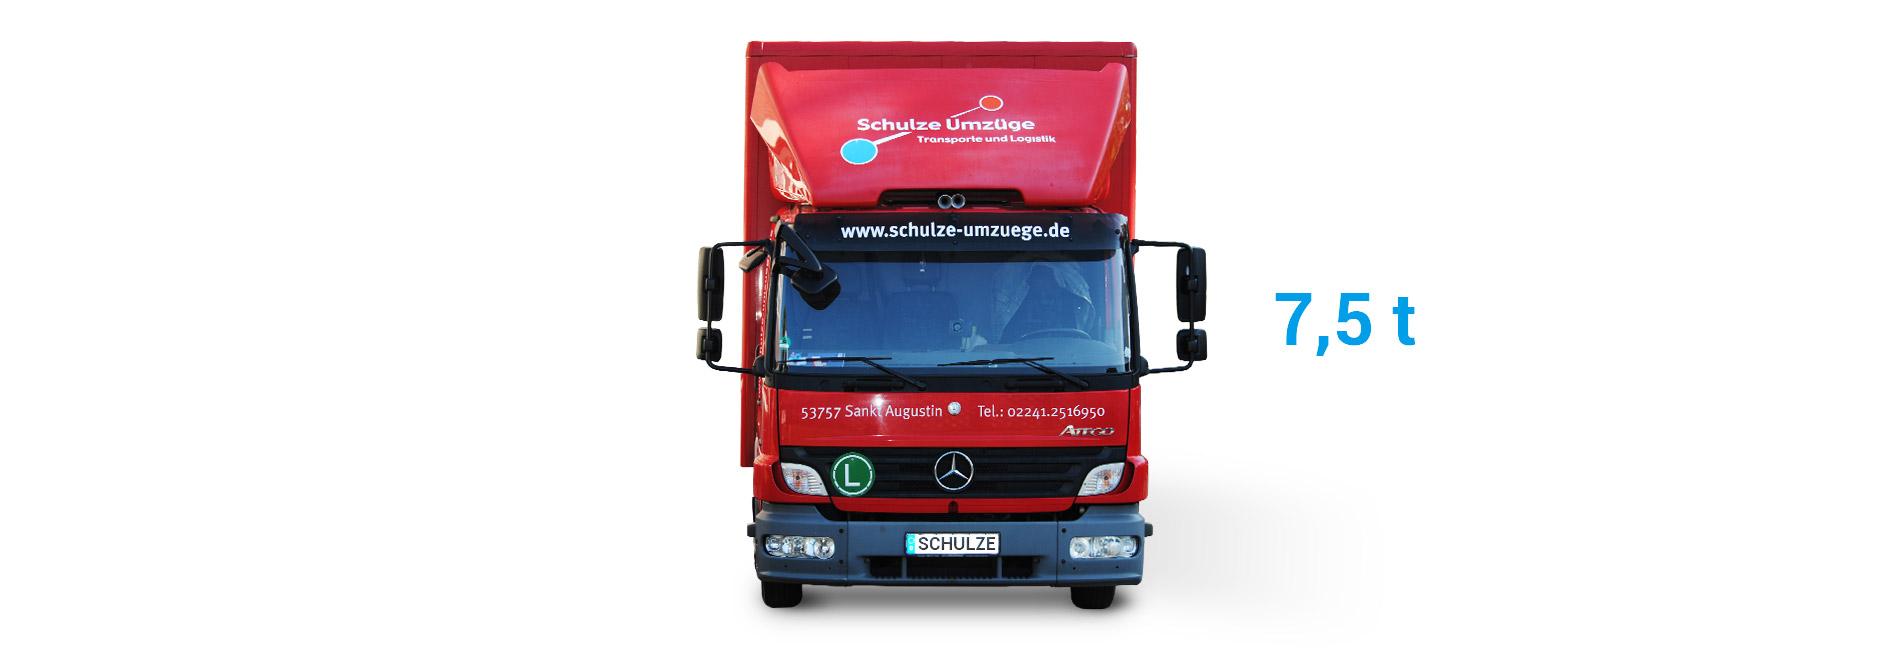 Umzugsunternehmen Sankt Augustin schulze transporte und logistik